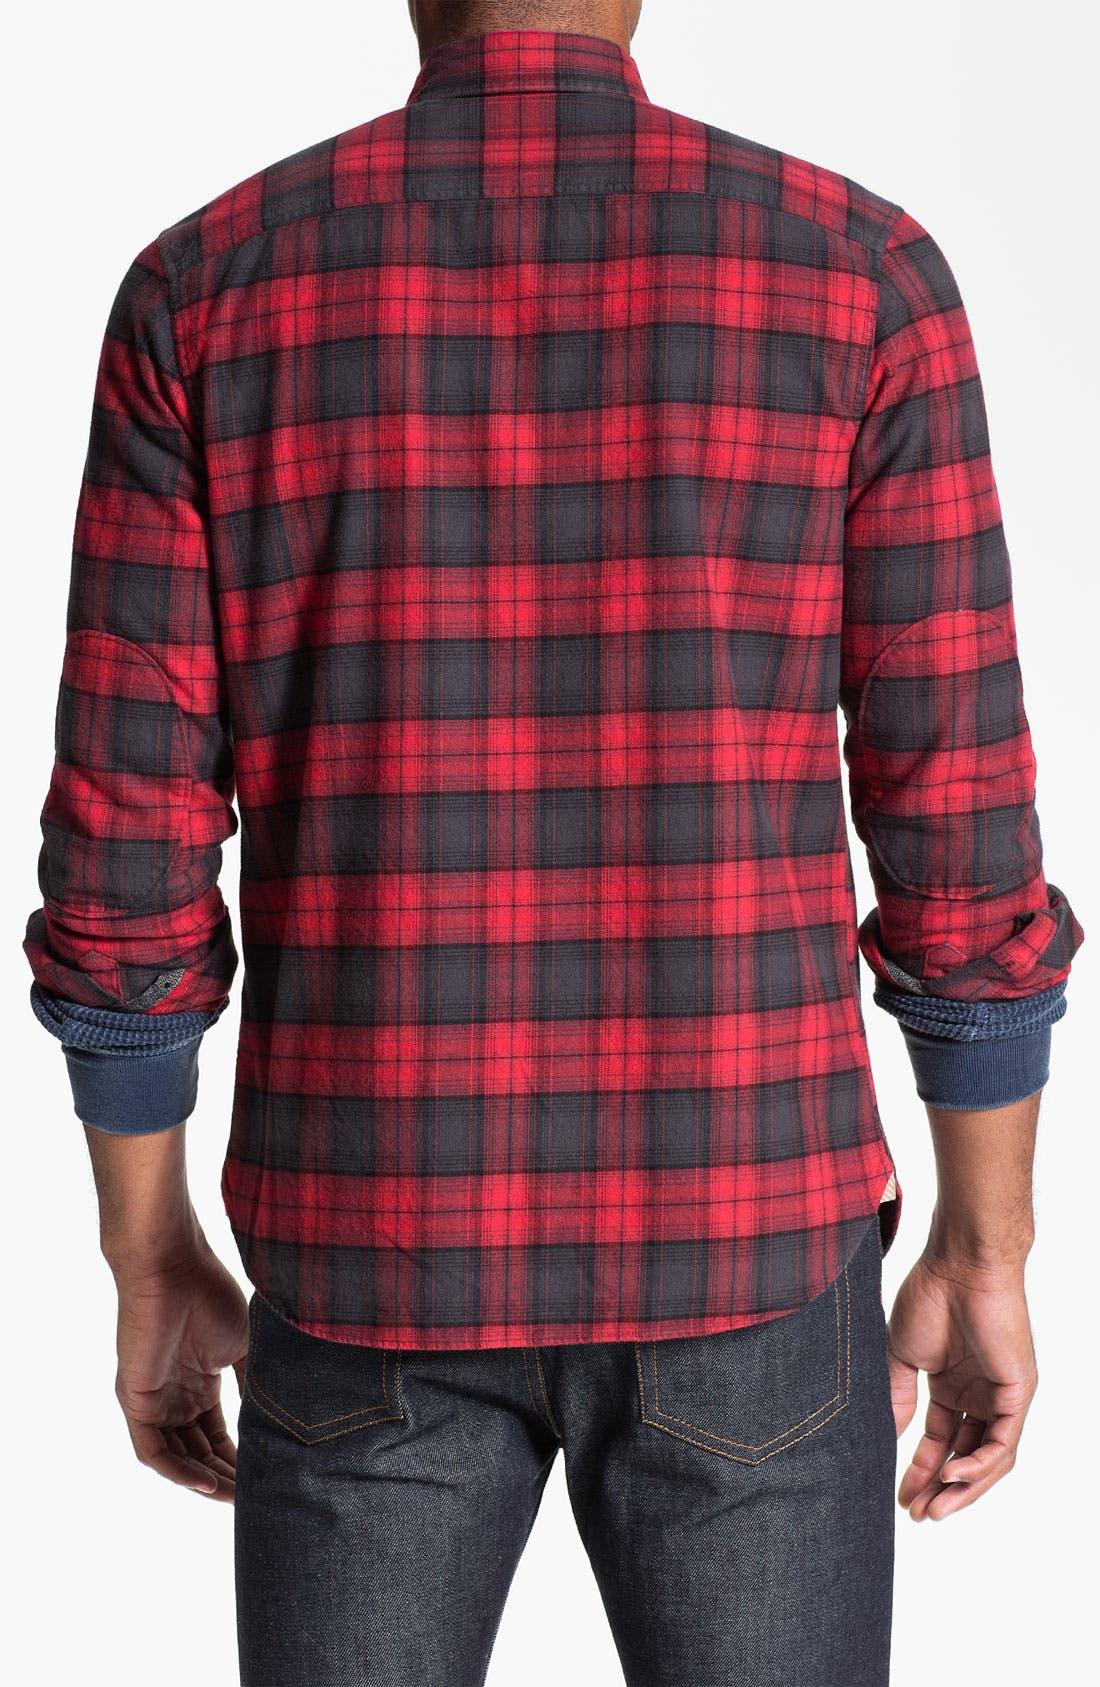 Alternate Image 2  - Wallin & Bros. Plaid Flannel Shirt